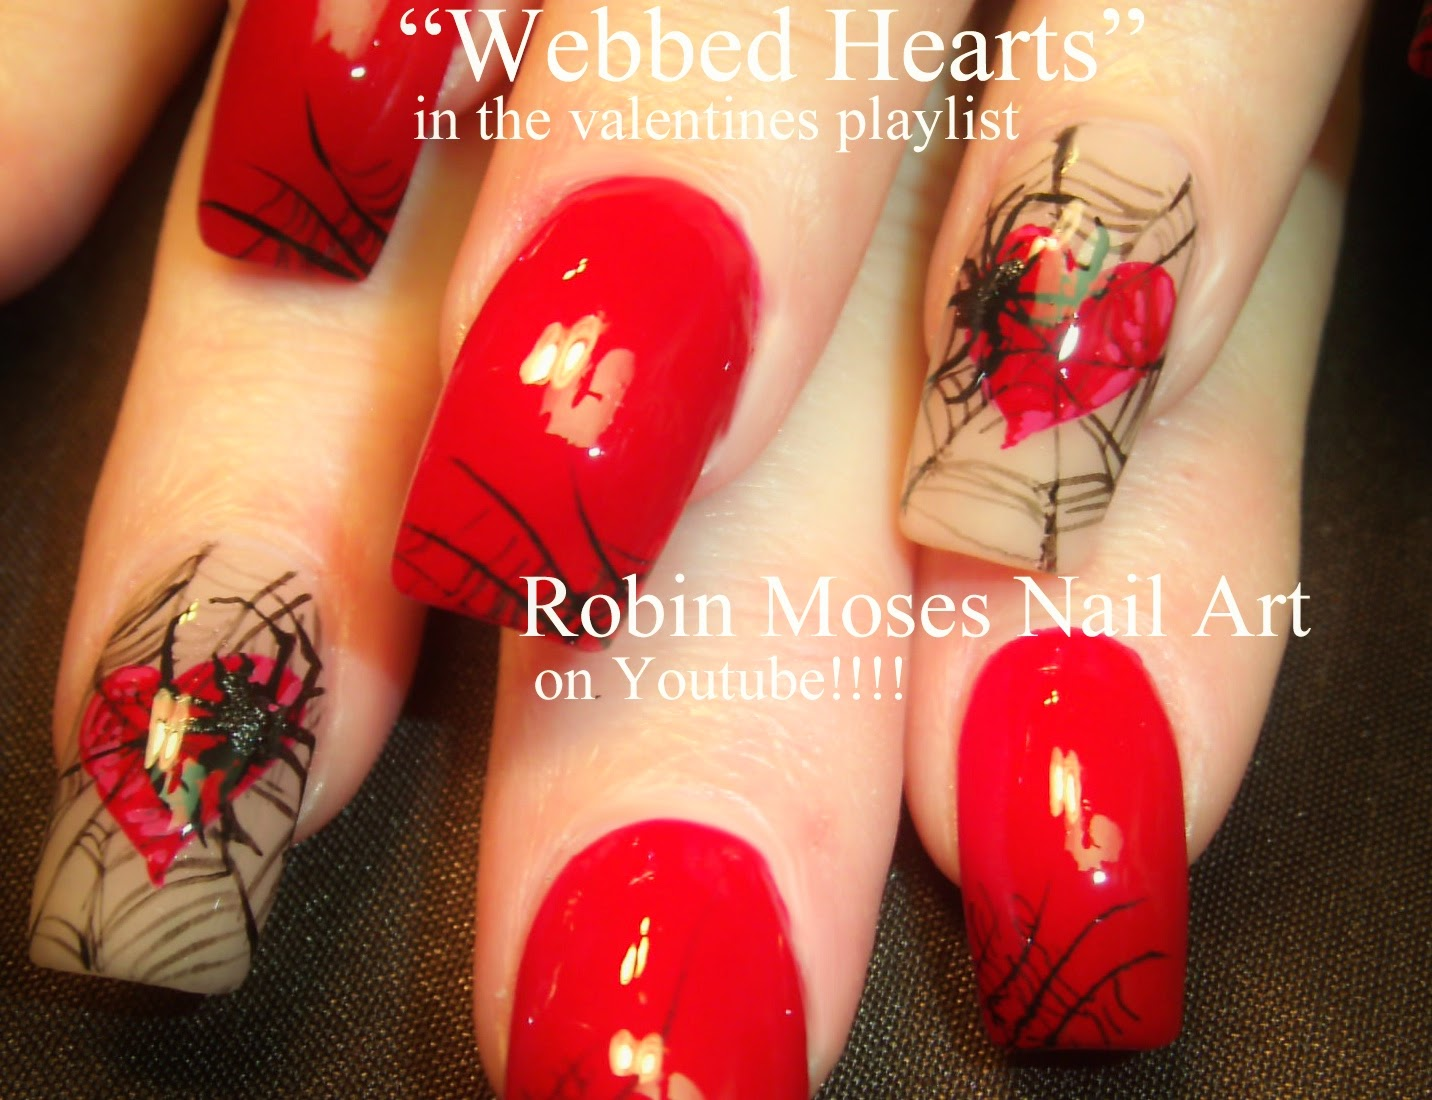 Red Nail Designs 2014 | www.pixshark.com - Images ...